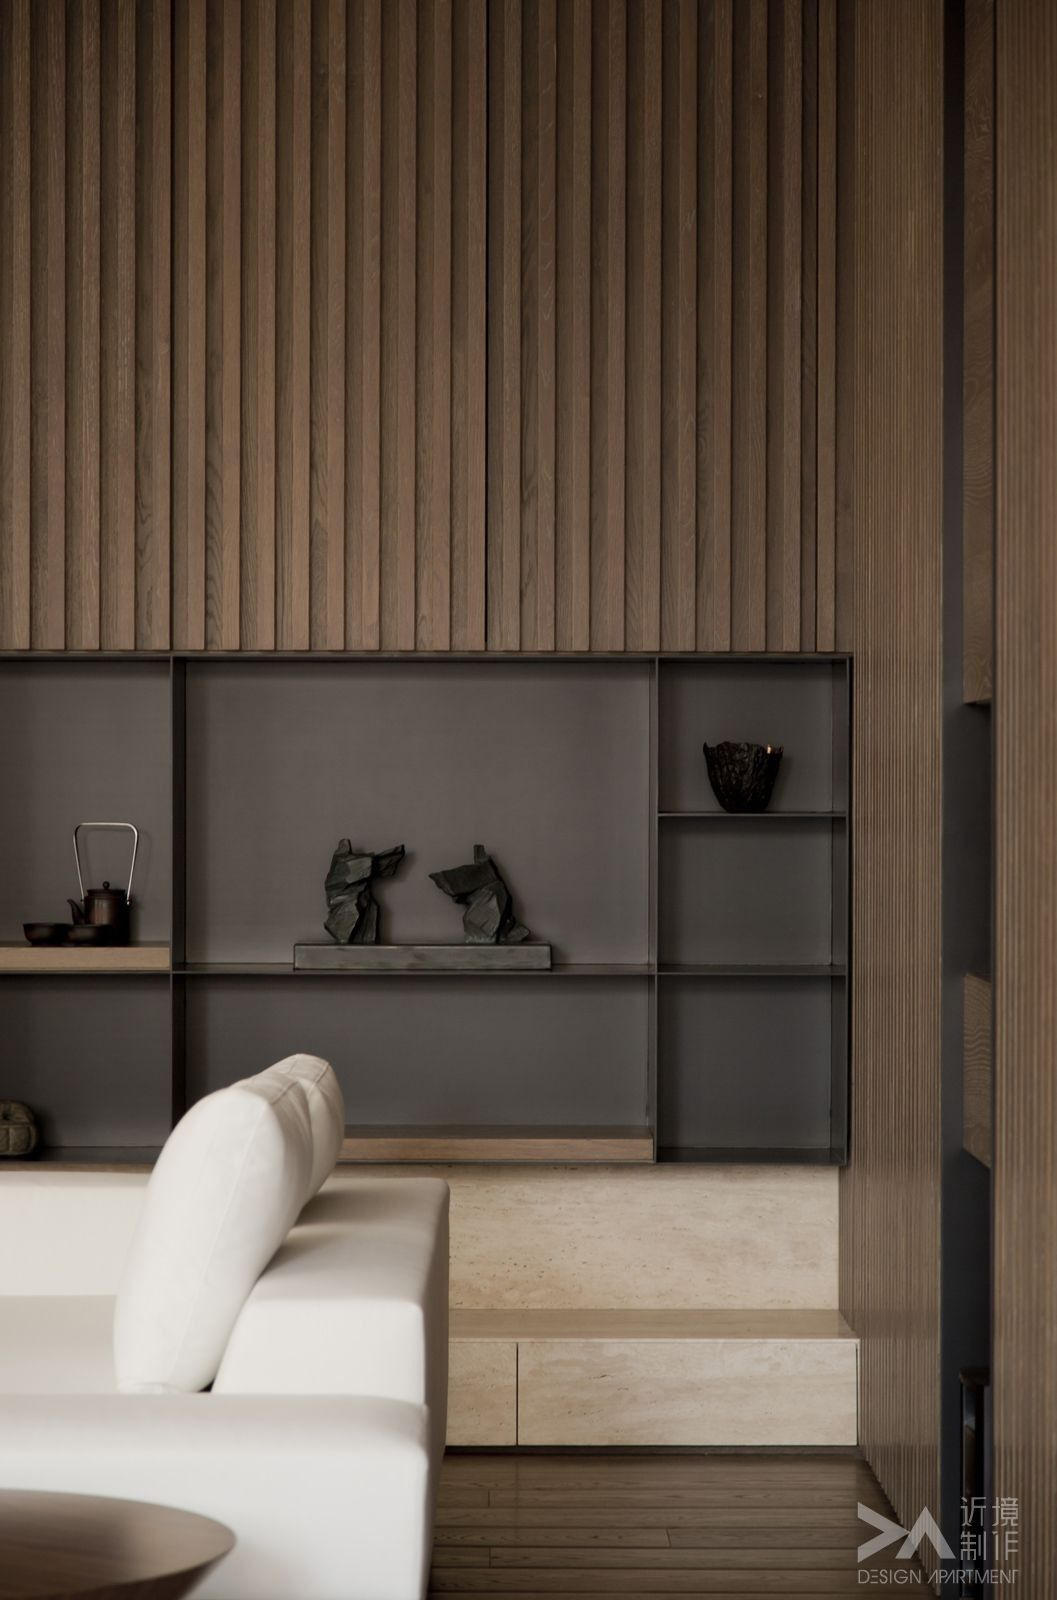 modern interieurontwerp interieurarchitectuur moderne interieurs eigentijds interieur boekenplank ontwerp bruin